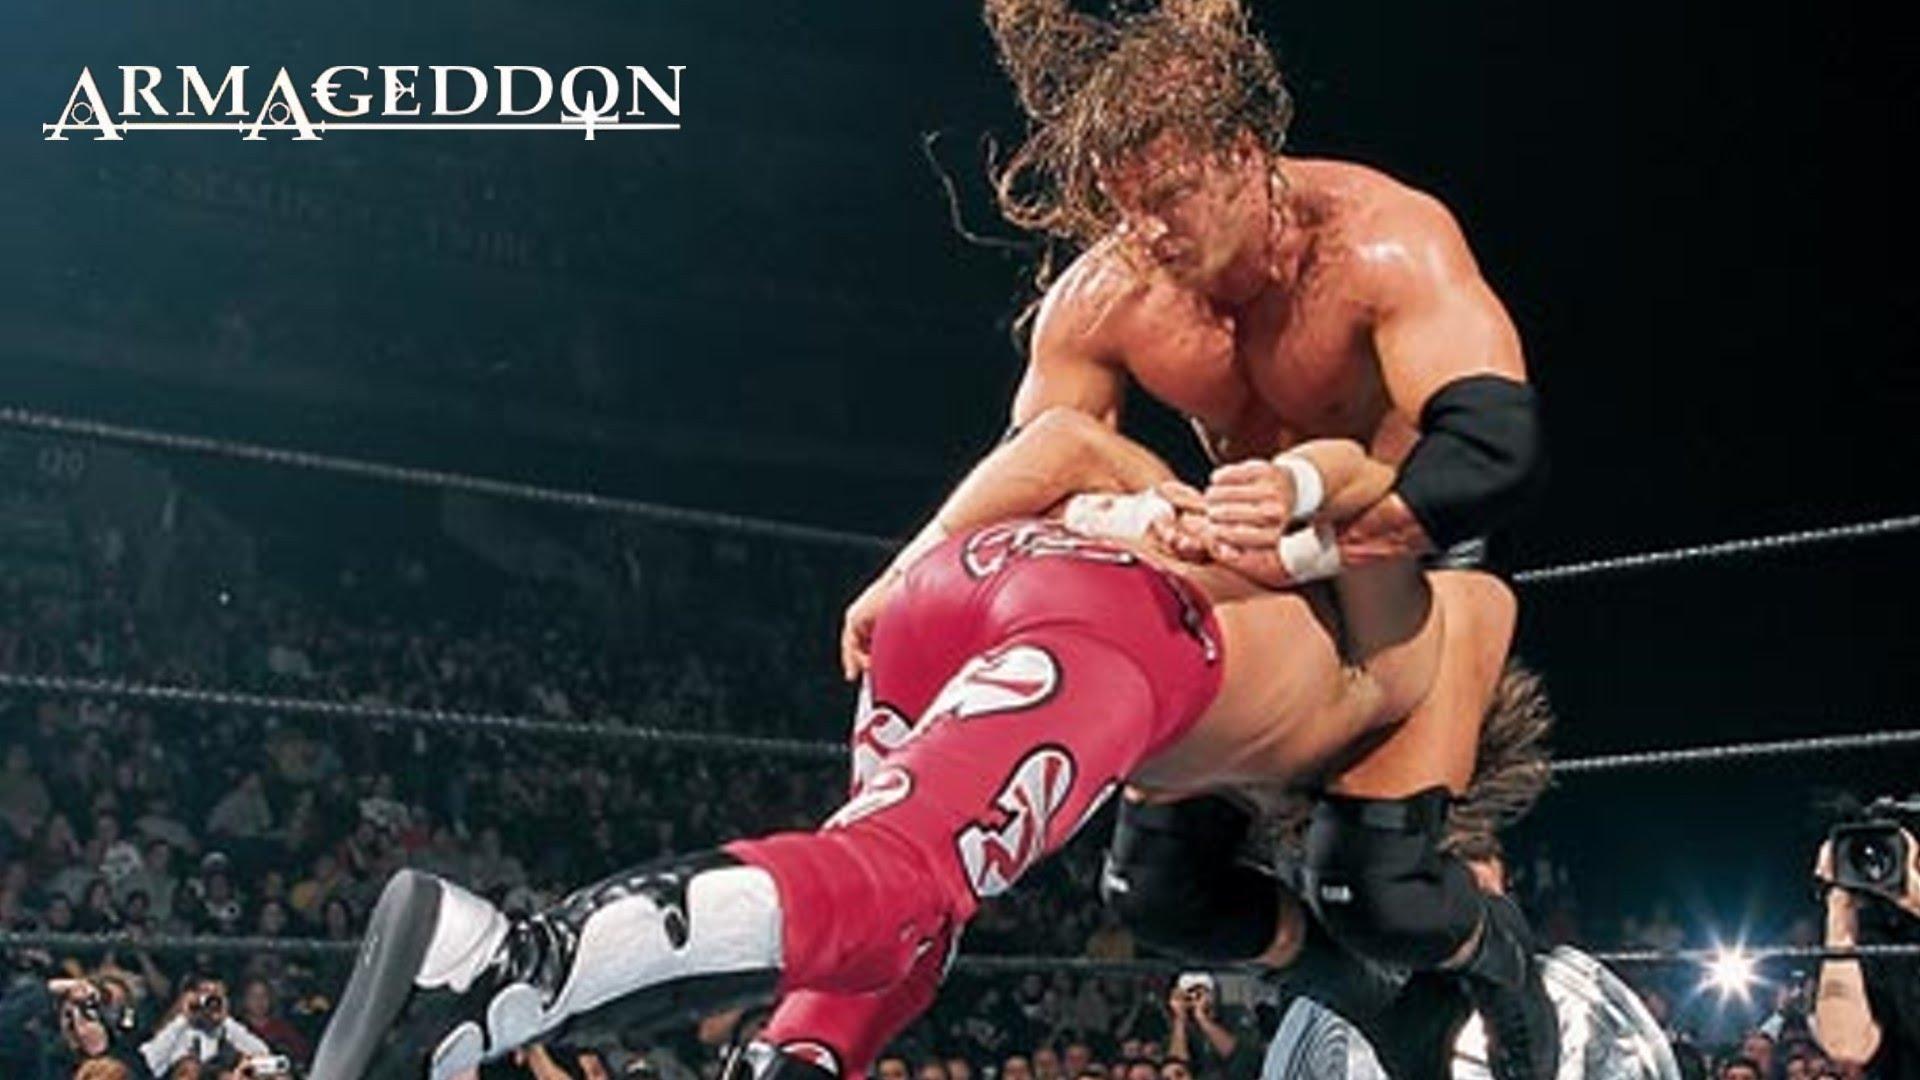 Armageddon 2002 Review